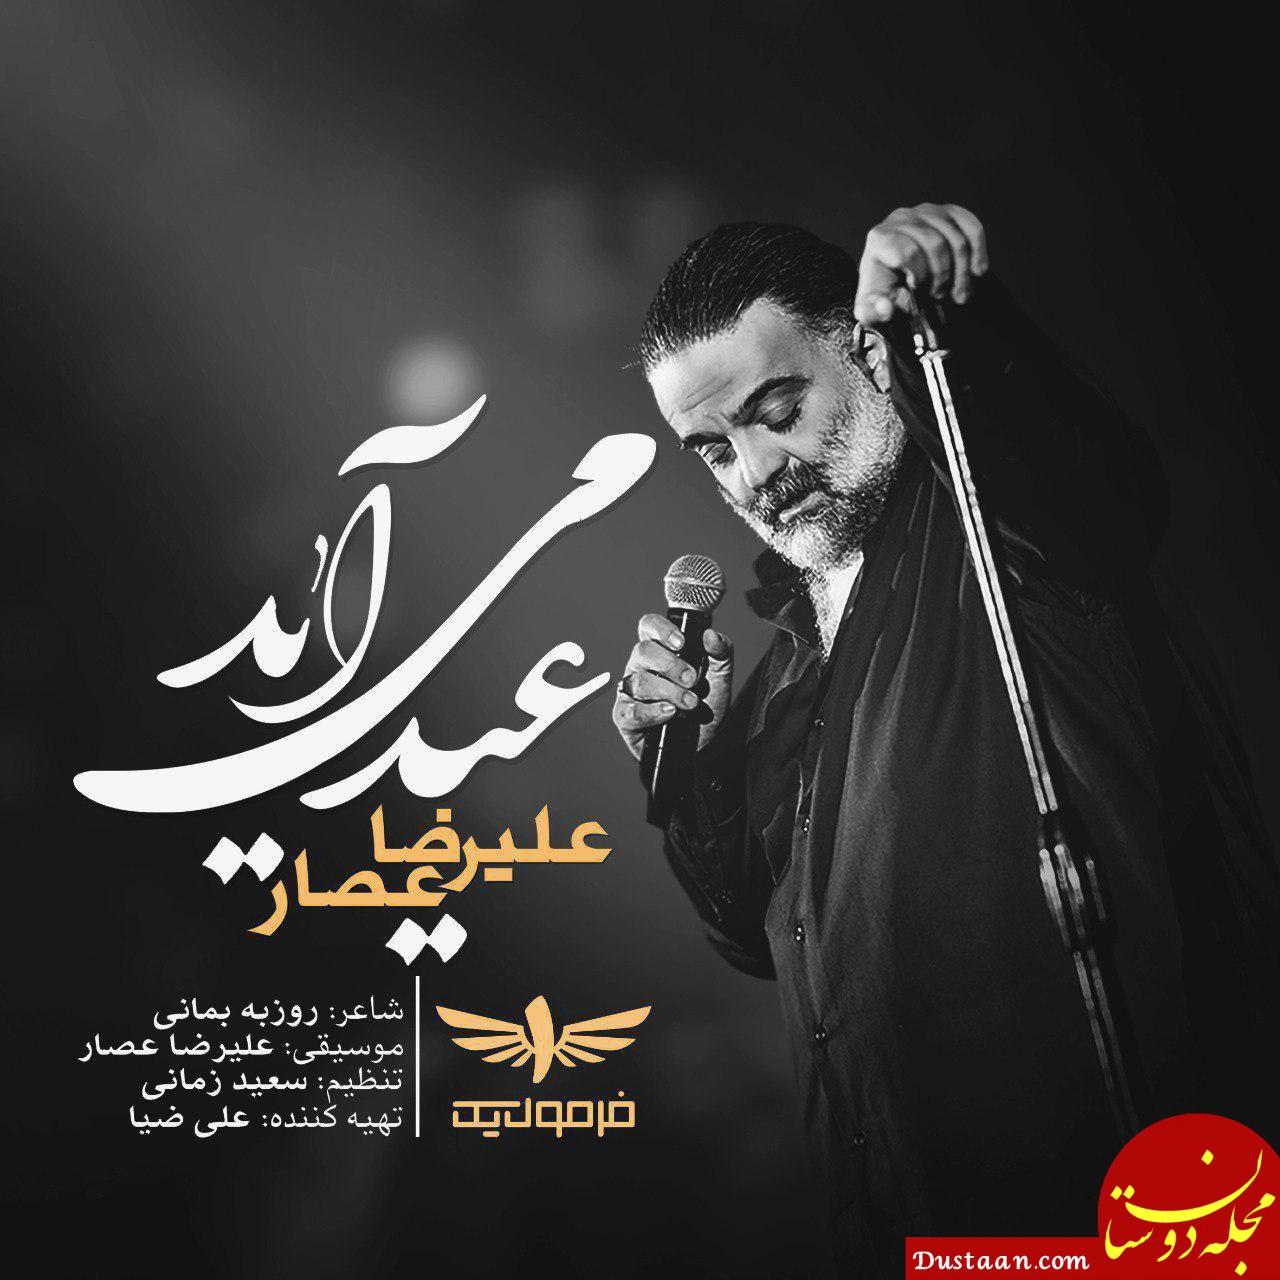 www.dustaan.com دانلود آهنگ جدید علیرضا عصار به نام عید می آید